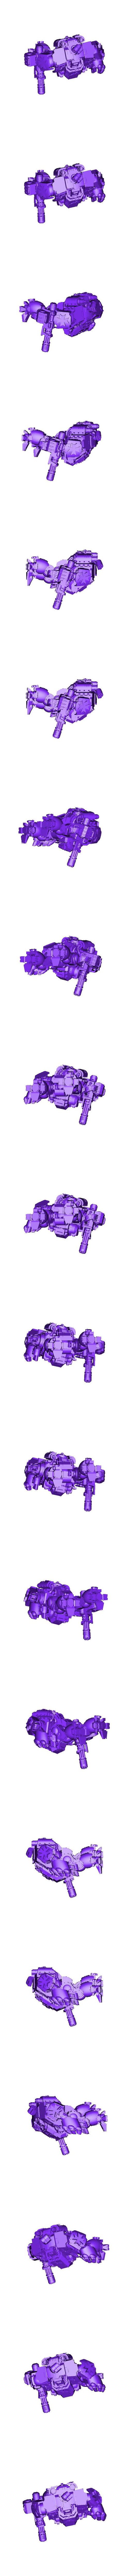 Dark Crusader - Redemption Mausoleum - Gatling + Flamer.stl Download free STL file Dark Crusader Redemption Mausoleum • 3D printer design, GrimmTheMaker